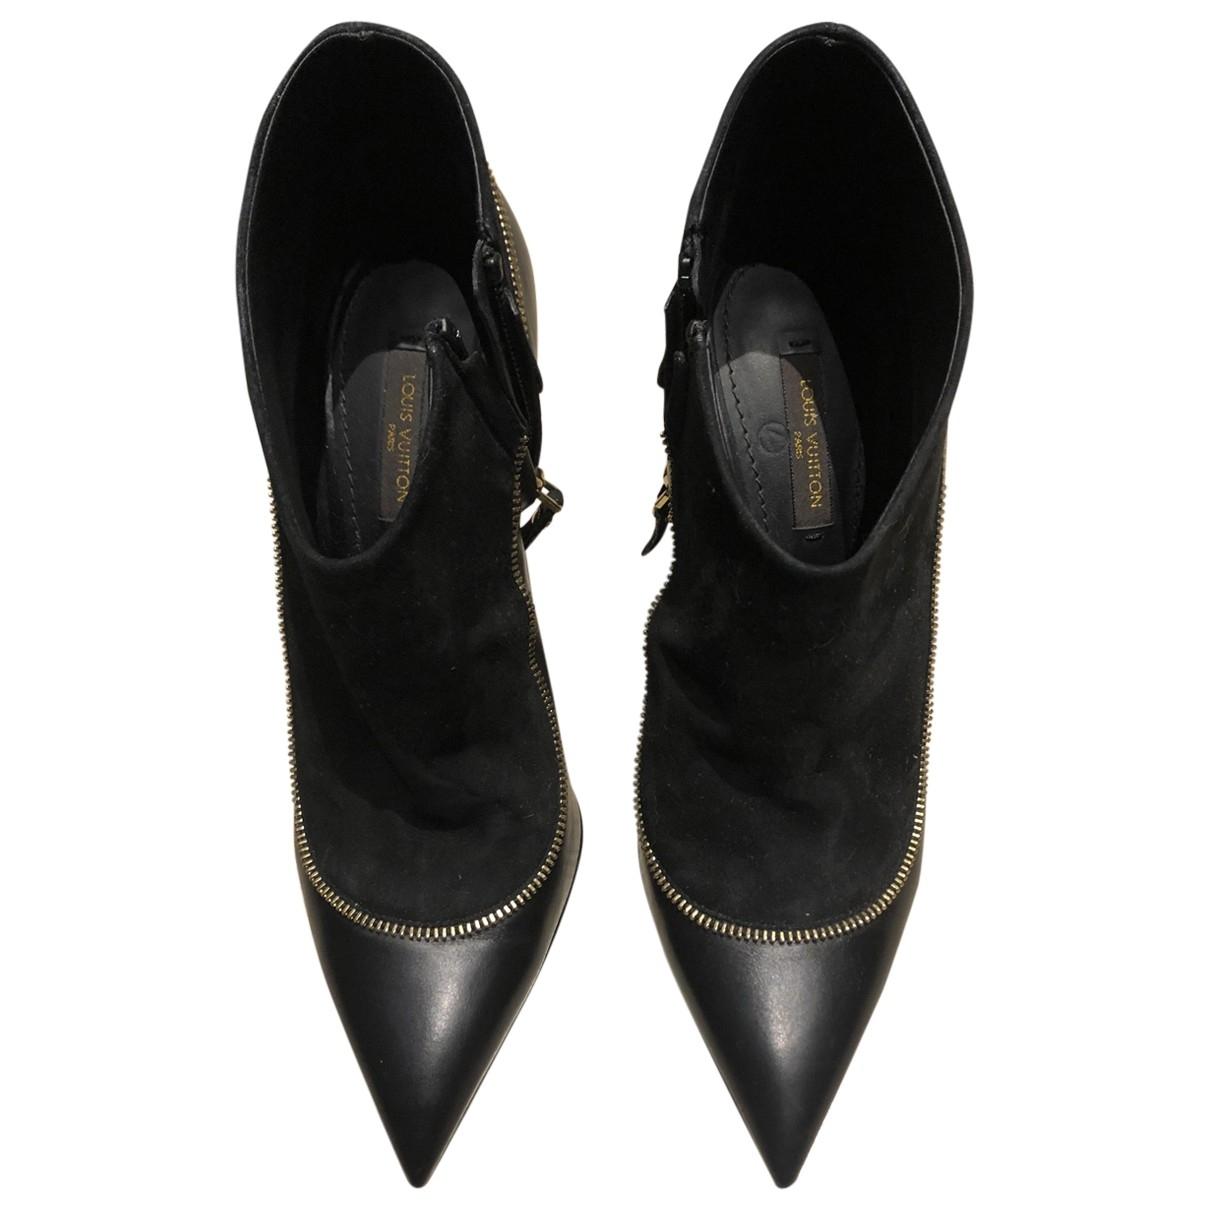 Louis Vuitton \N Black Leather Ankle boots for Women 36.5 EU